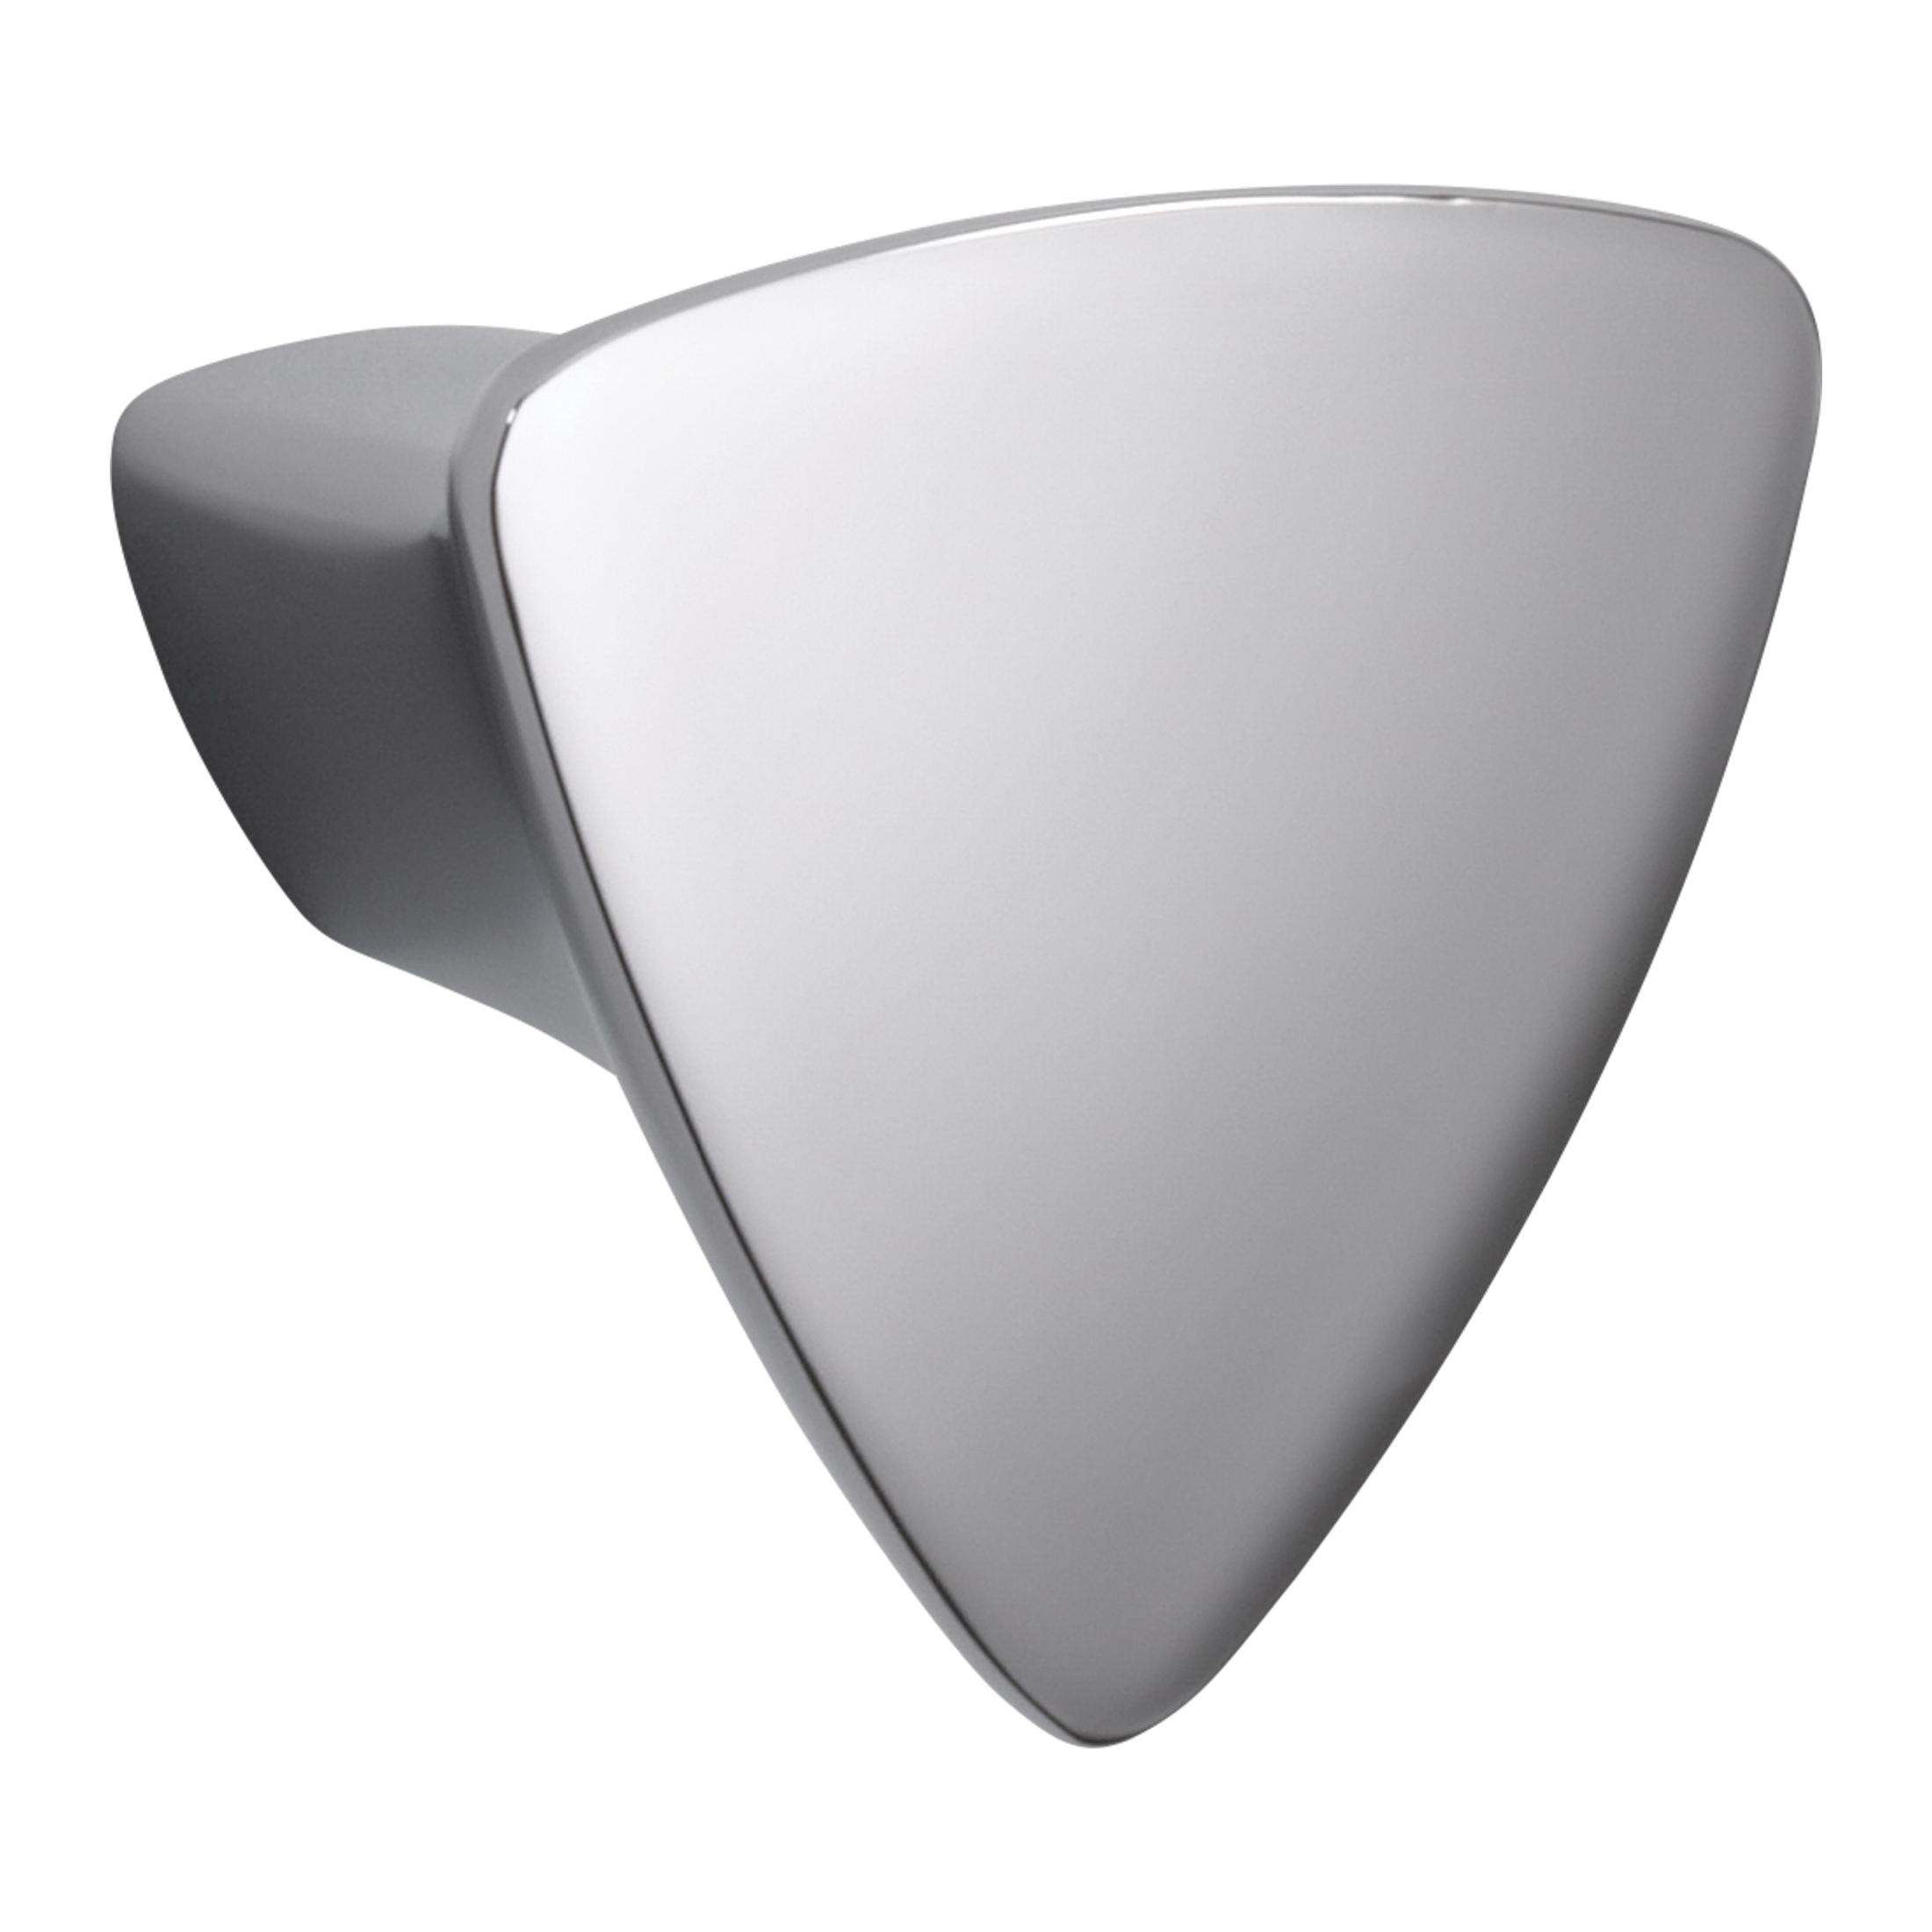 Brizo® 699250-PC Sotria™ Drawer Knob, Metal, Chrome Plated, Import